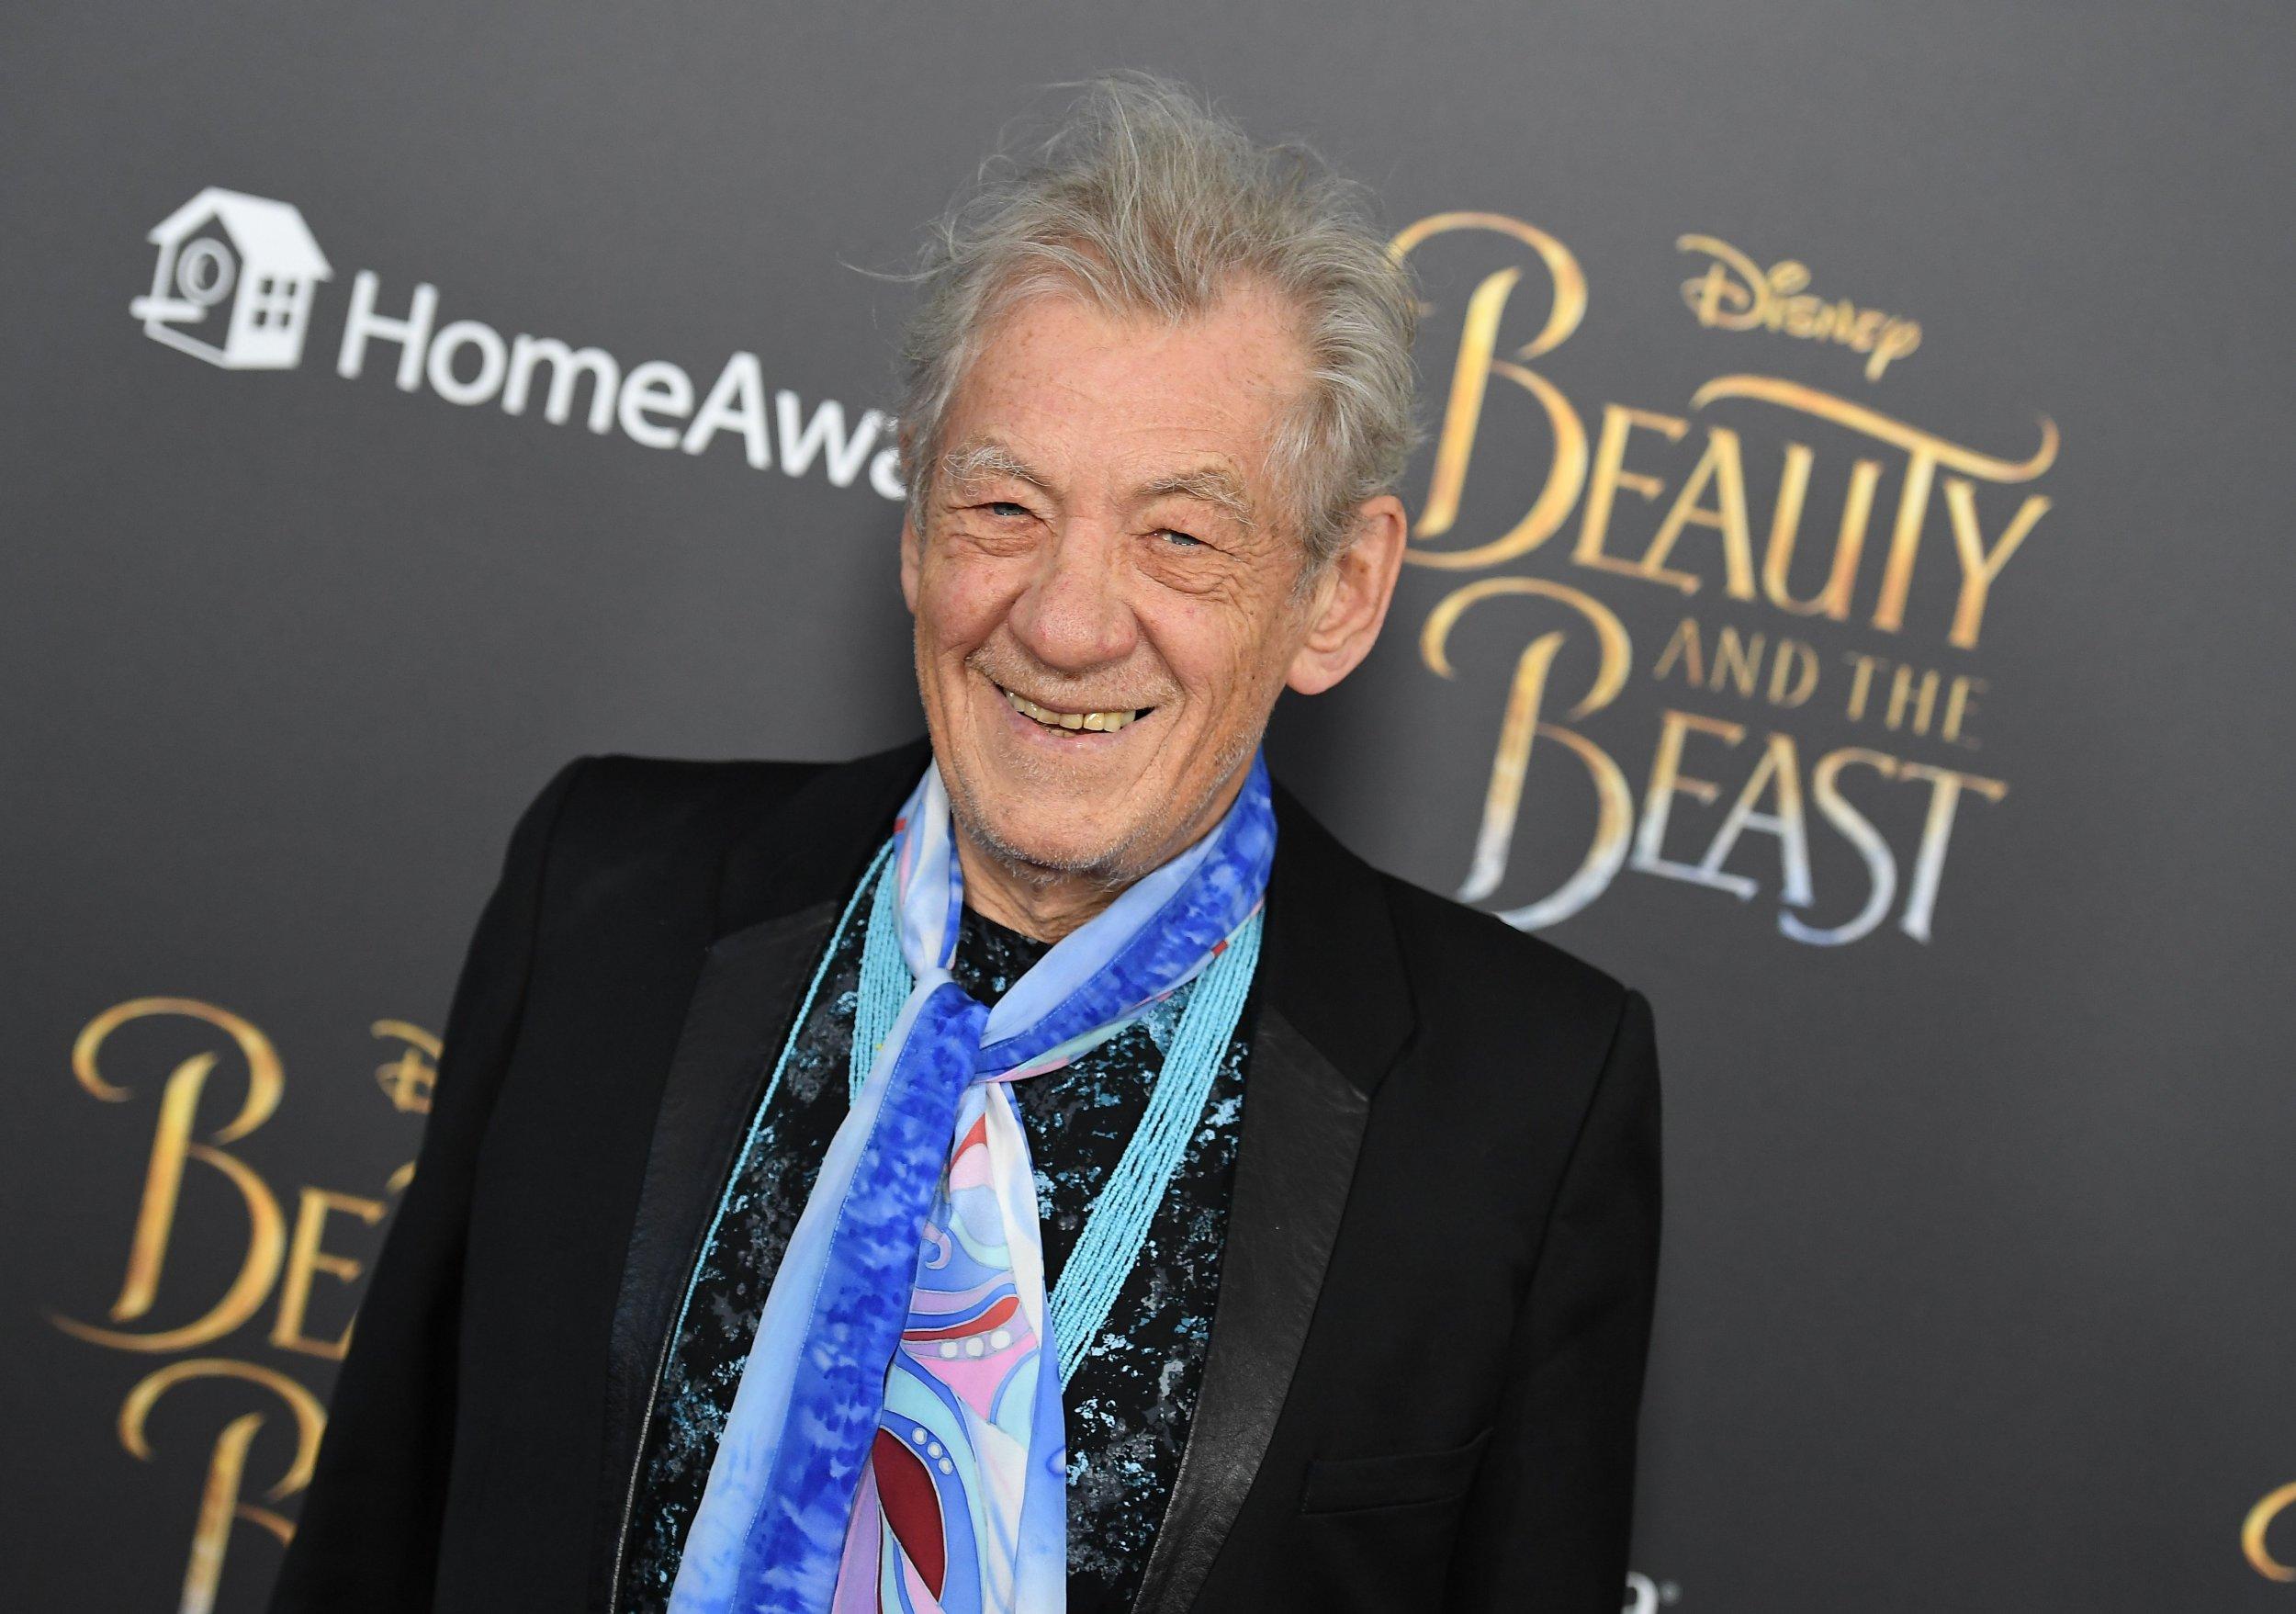 Sir Ian McKellen calls Beauty and the Beast a 'gay extravaganza'